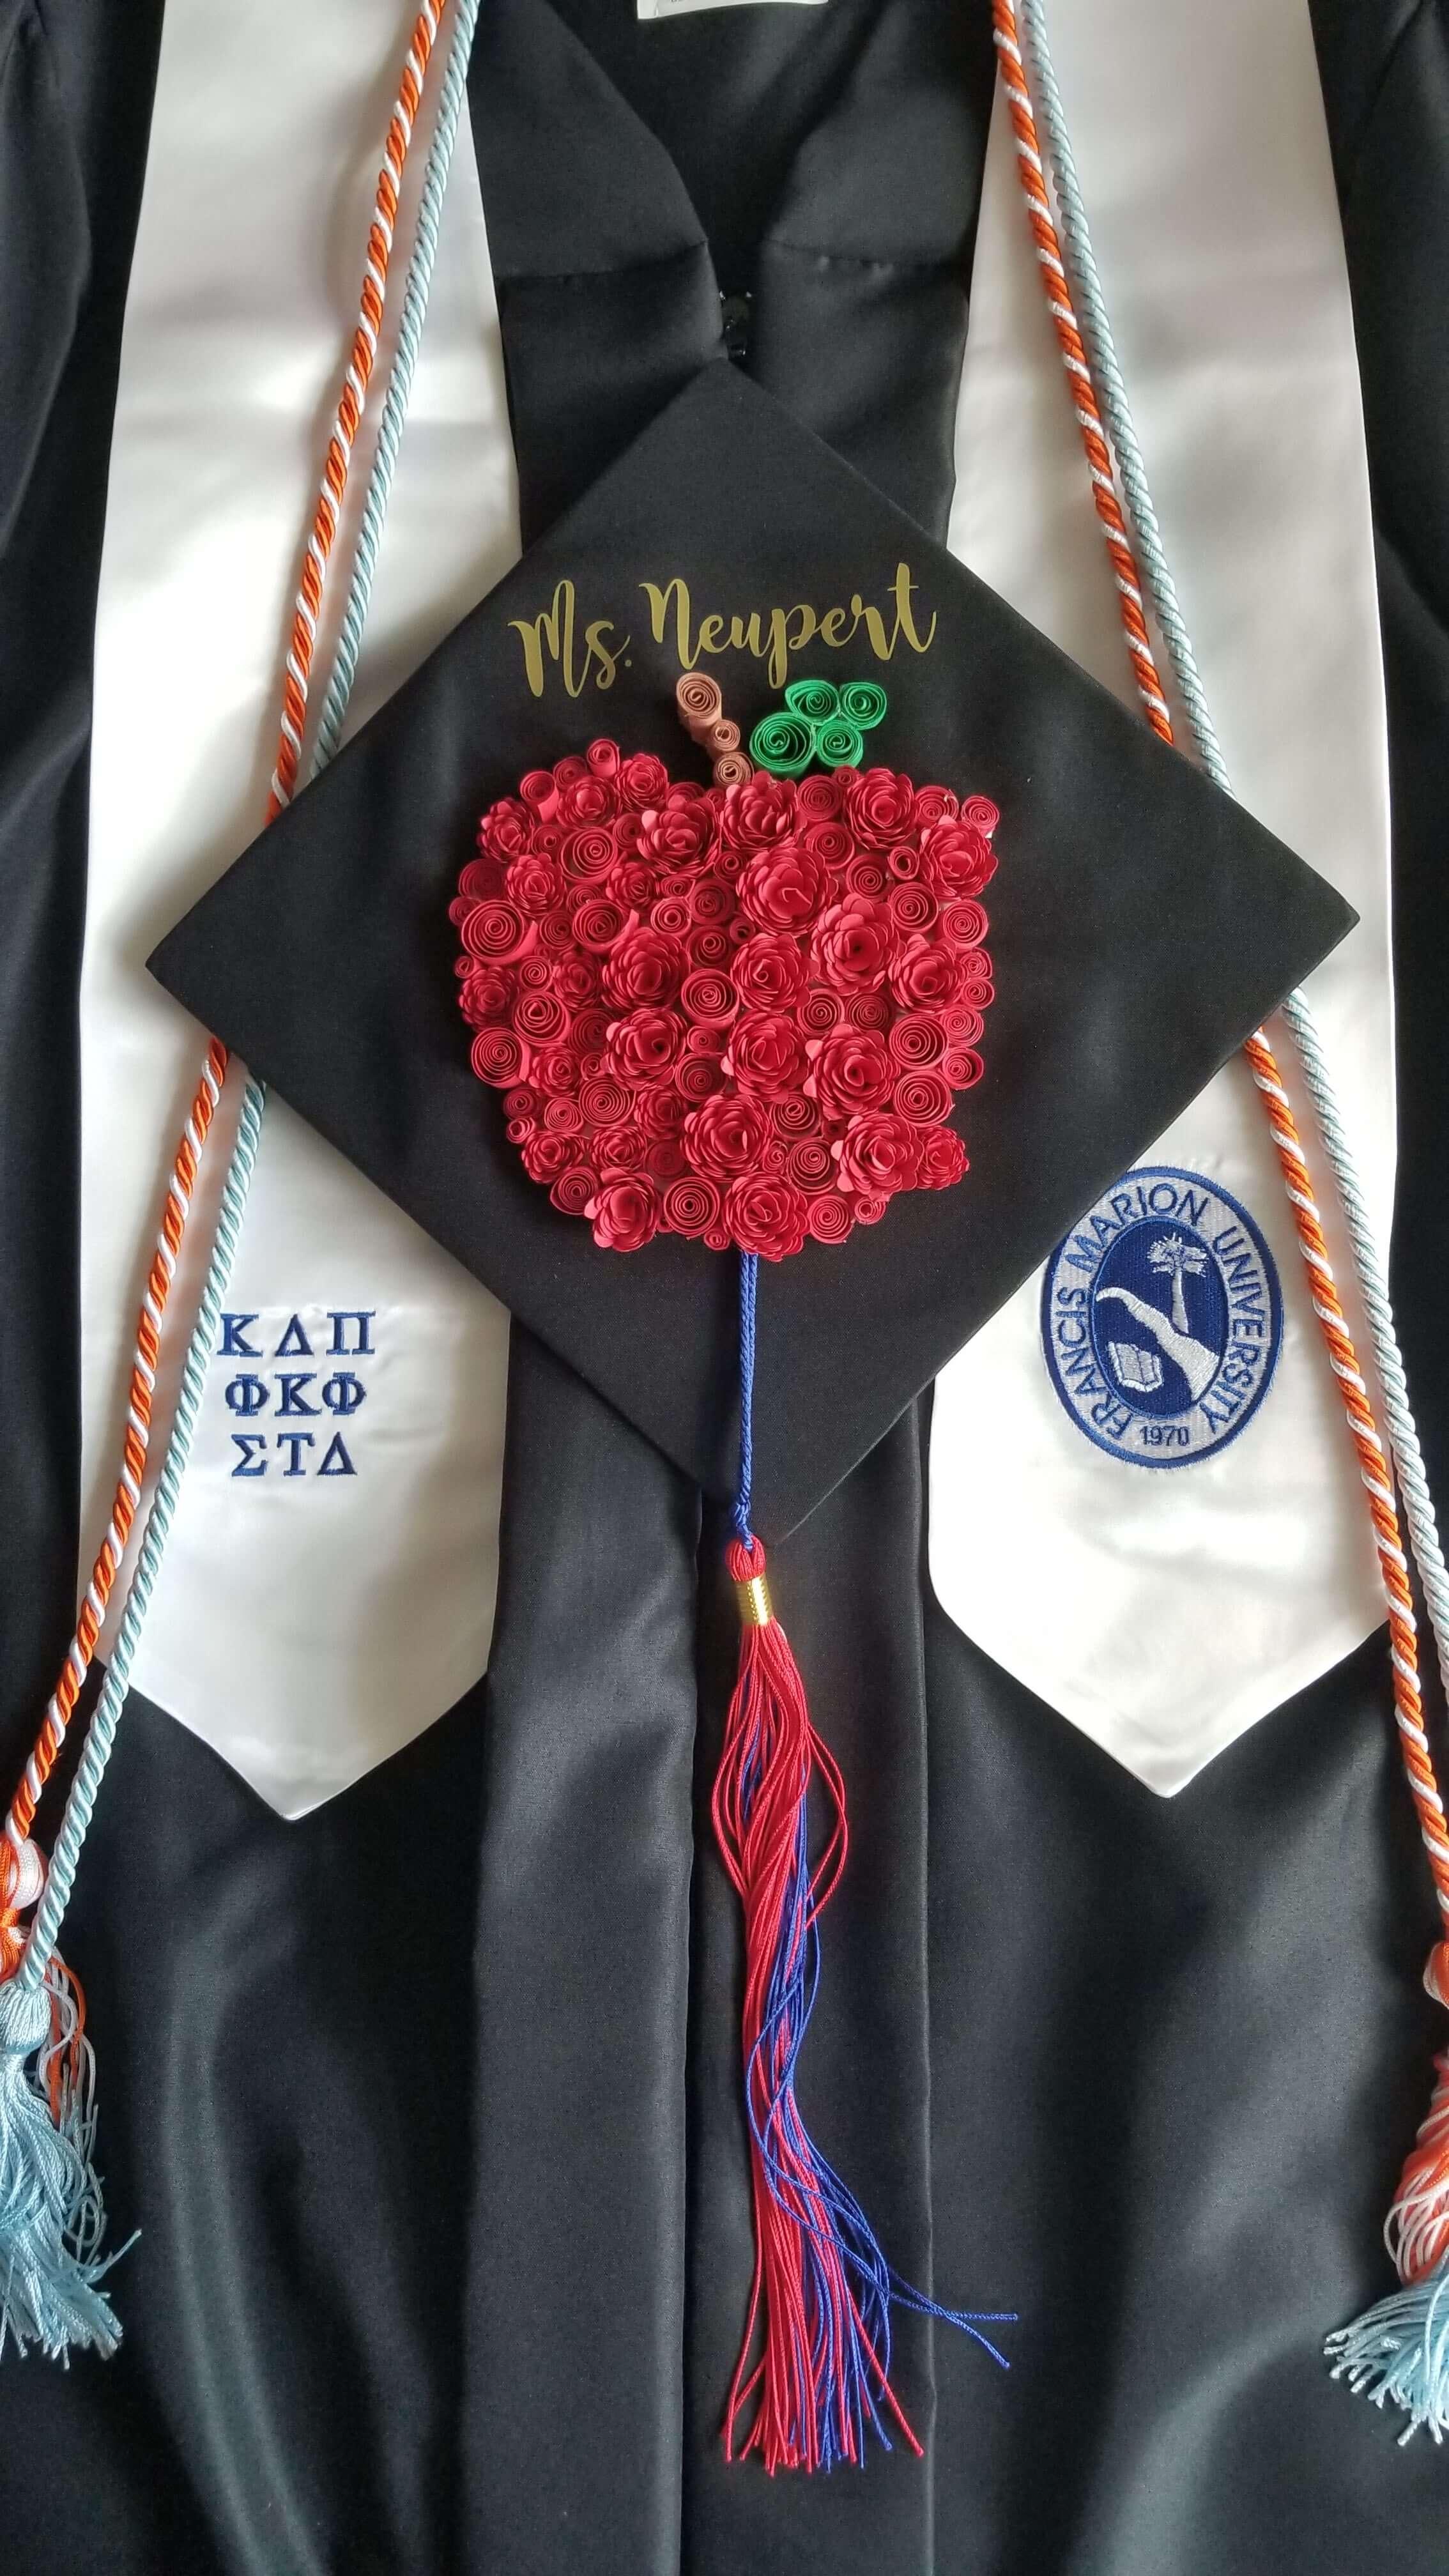 Melayna Neupert Personalized Graduation Cap and Regalia